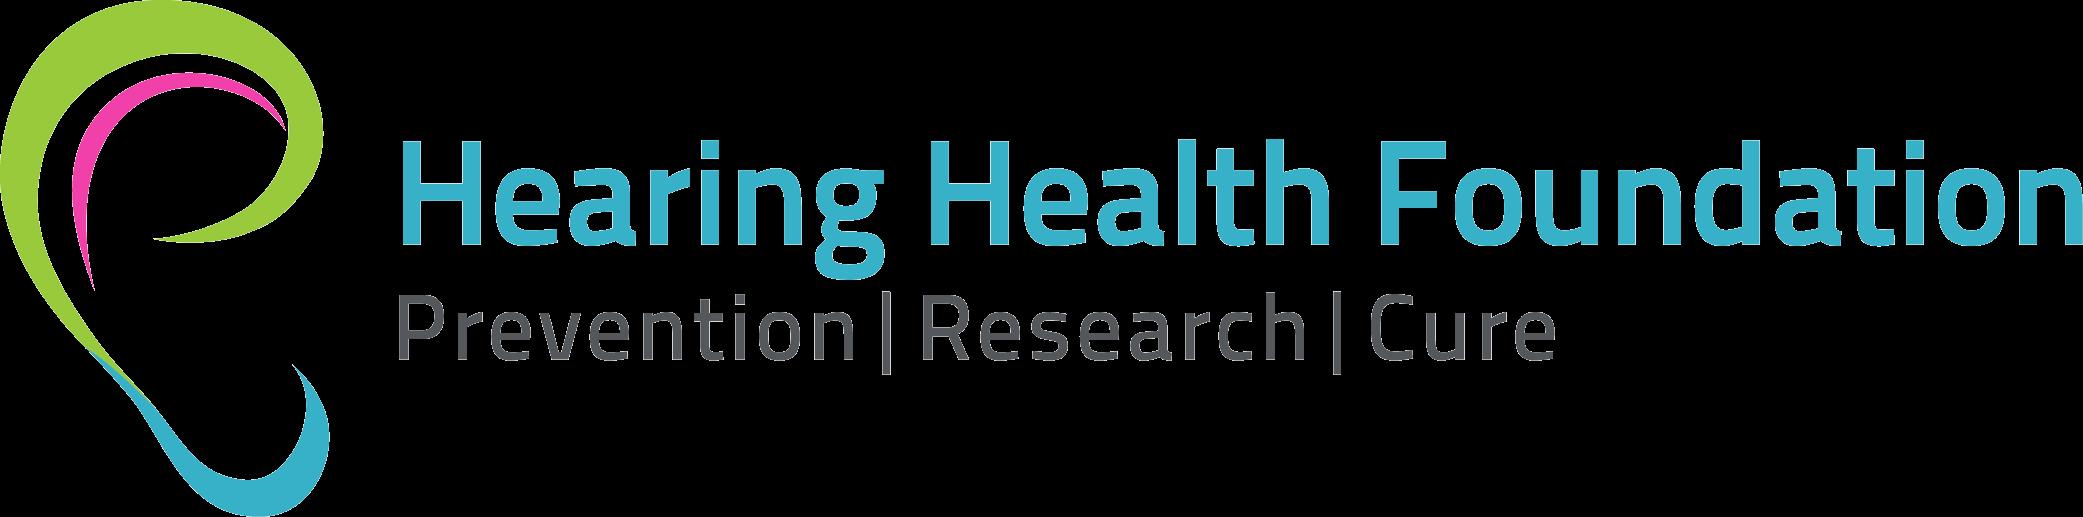 HHF Logo Brightr.png